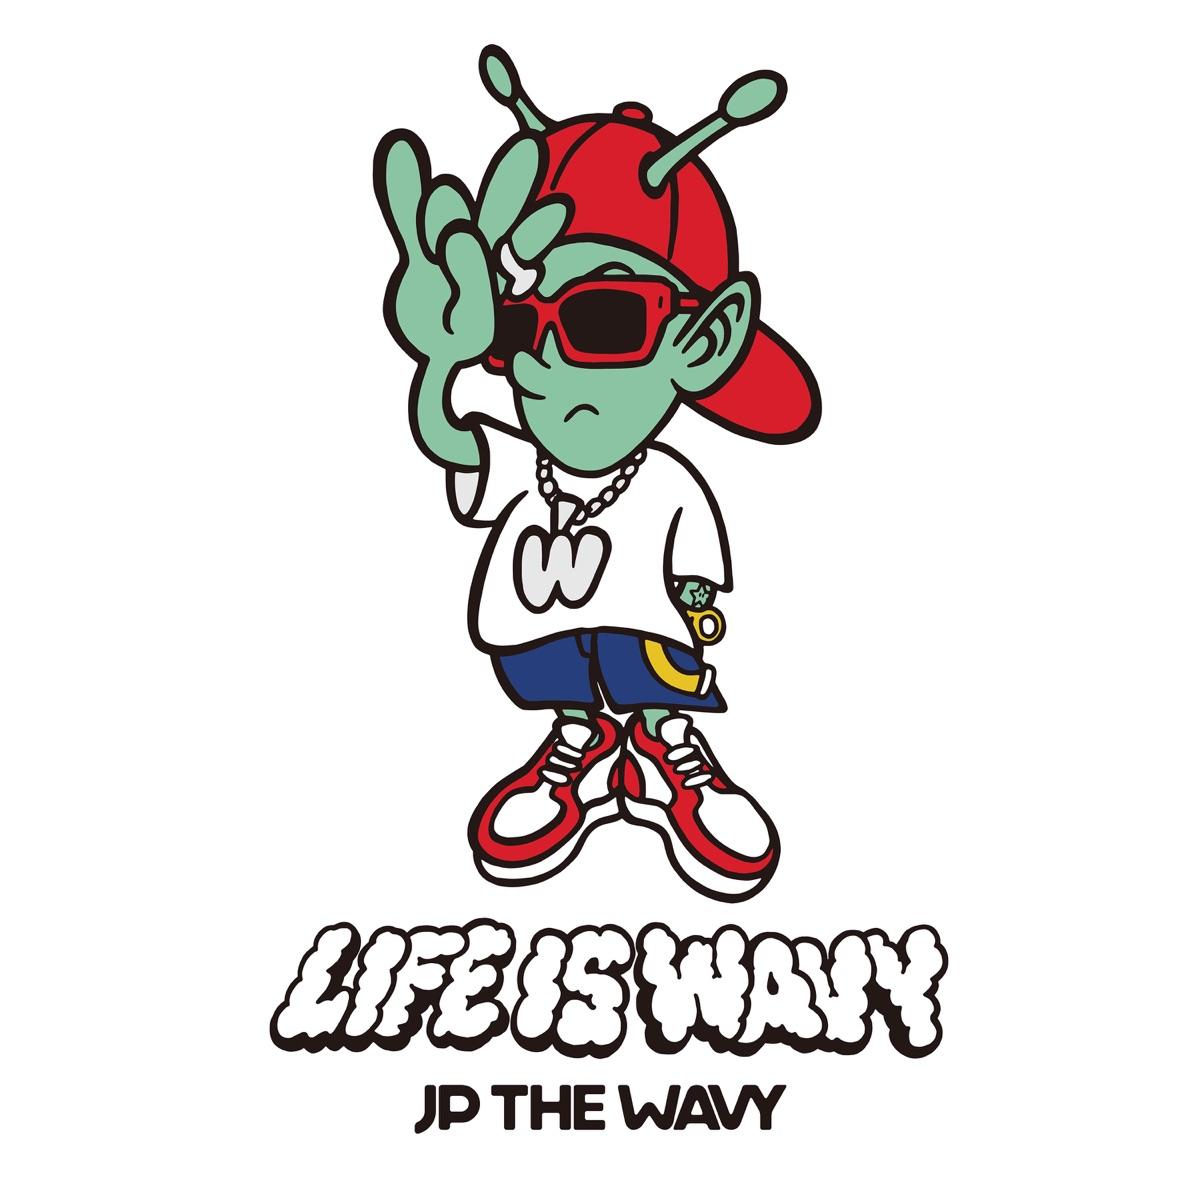 『JP THE WAVY - Beverly Hills feat. MIYACHI』収録の『LIFE IS WAVY』ジャケット